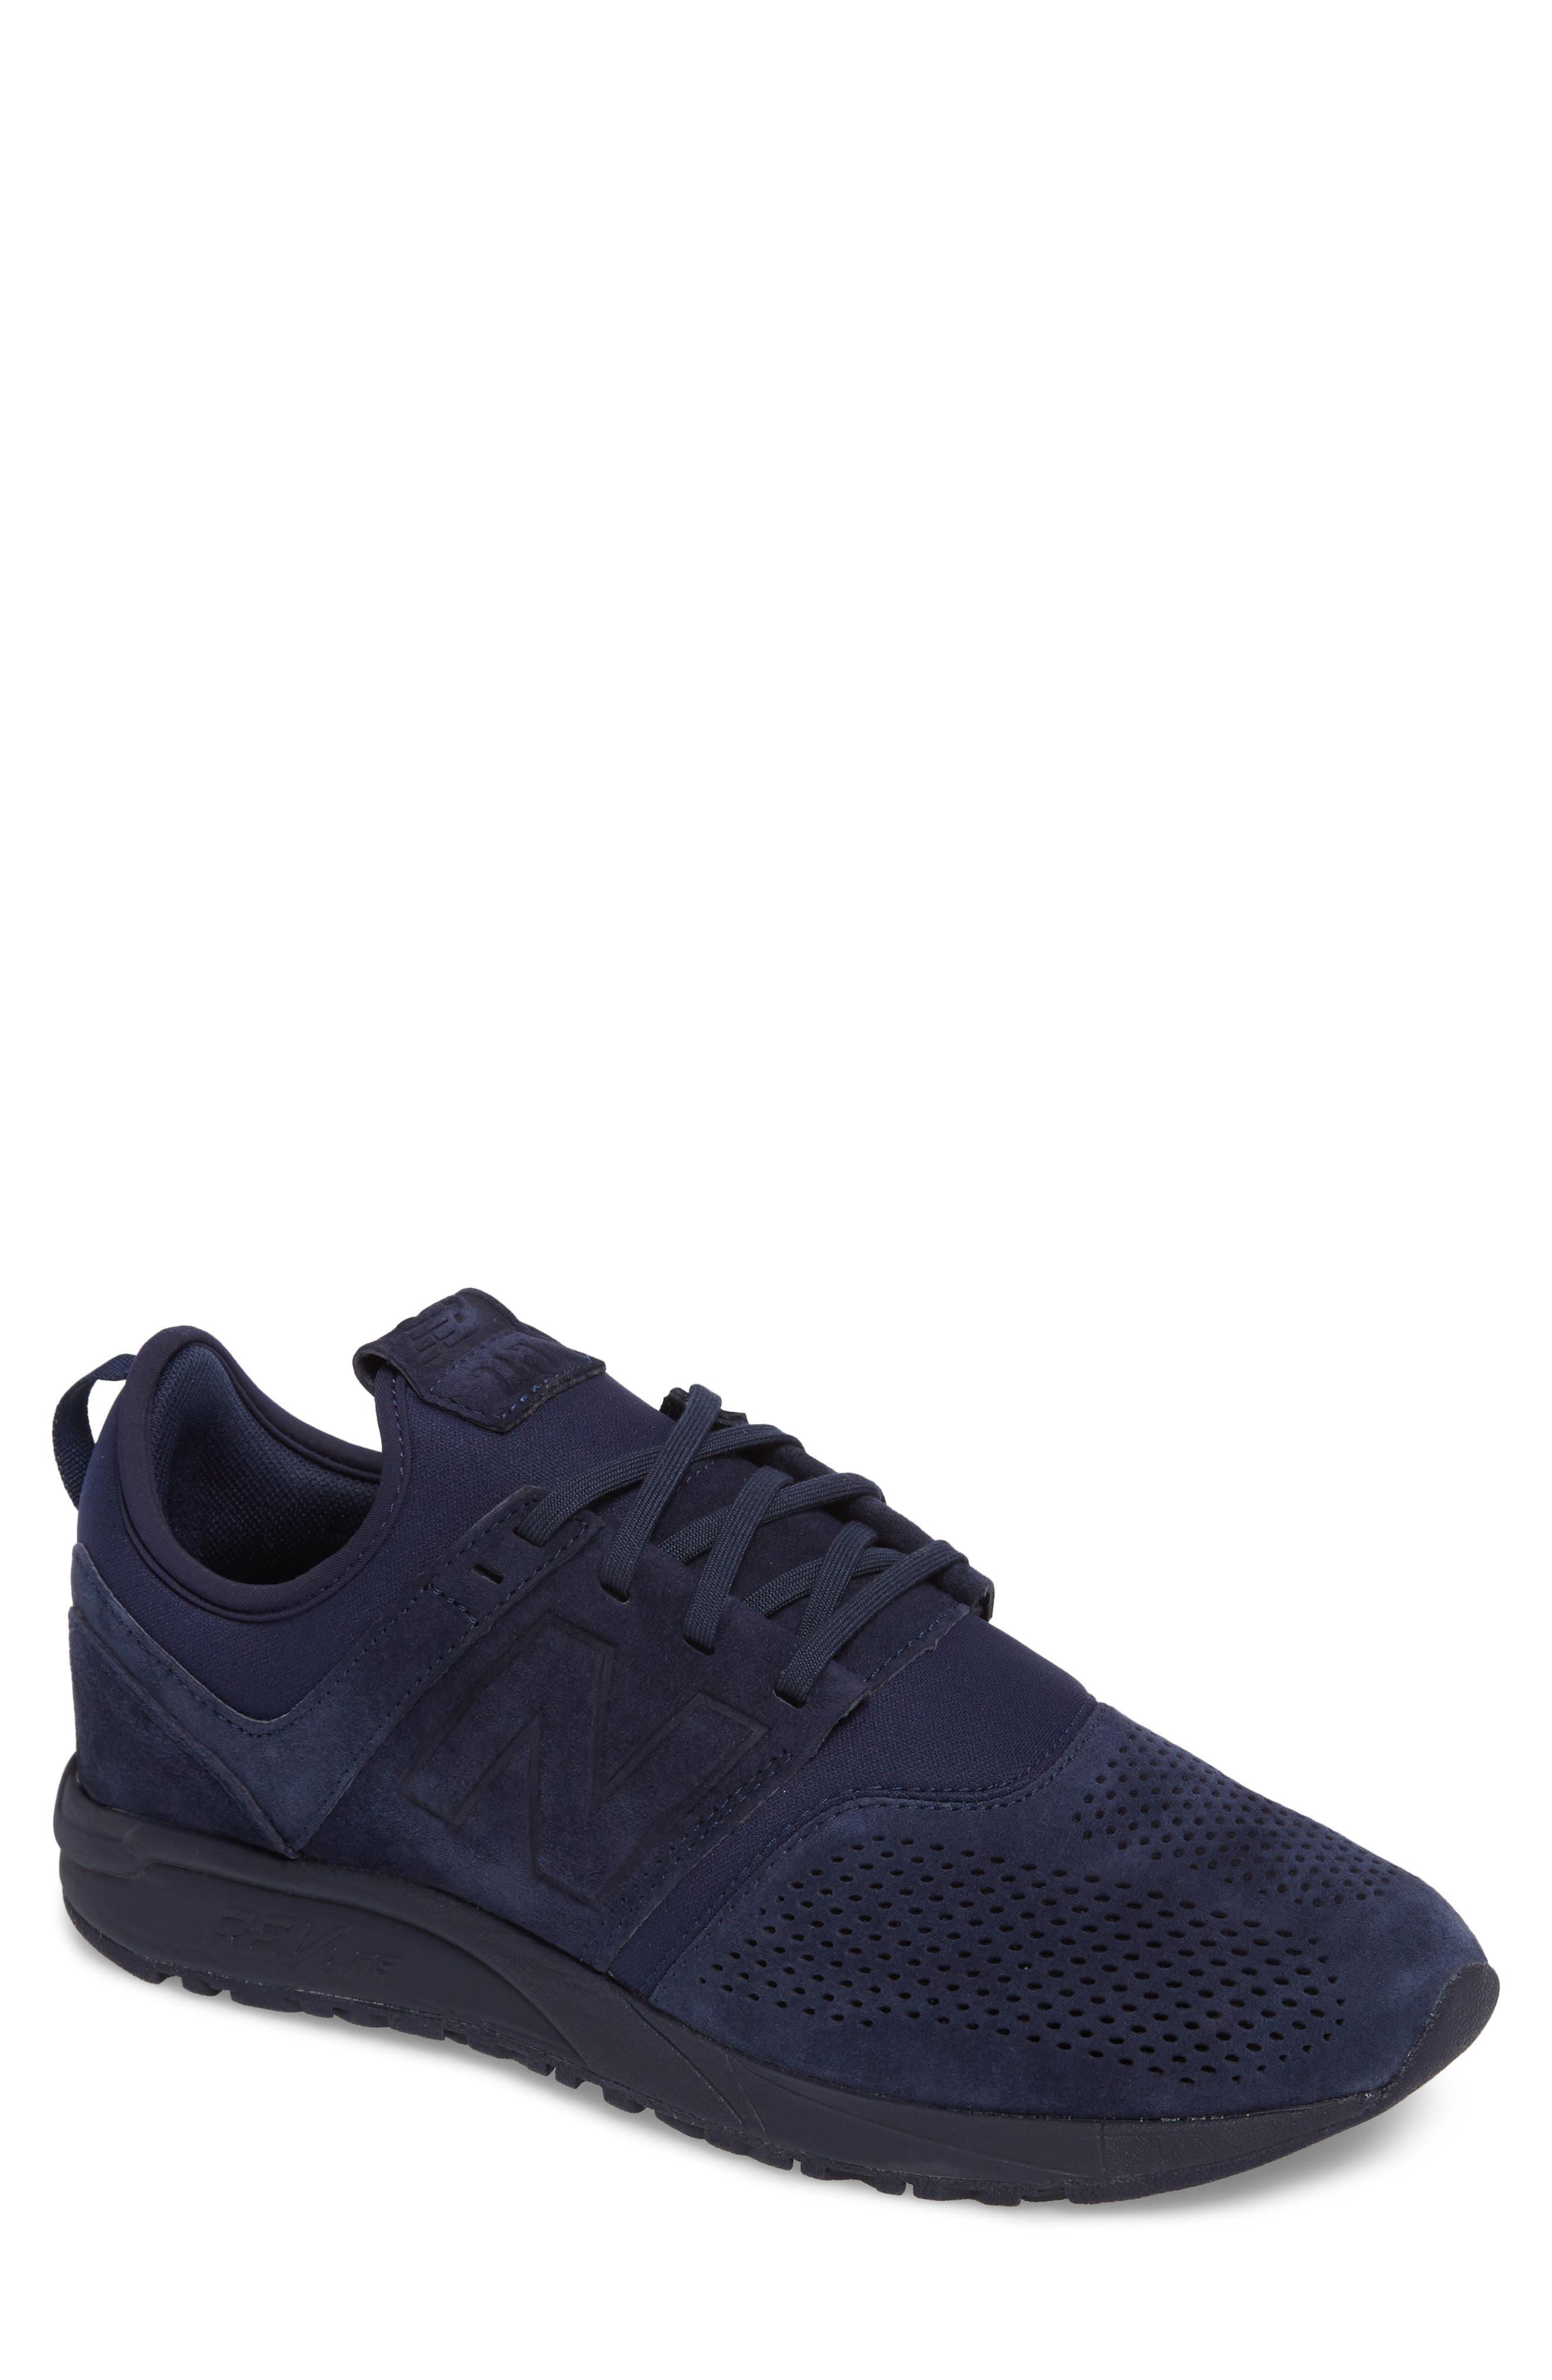 MRL247 Sneaker,                             Main thumbnail 2, color,